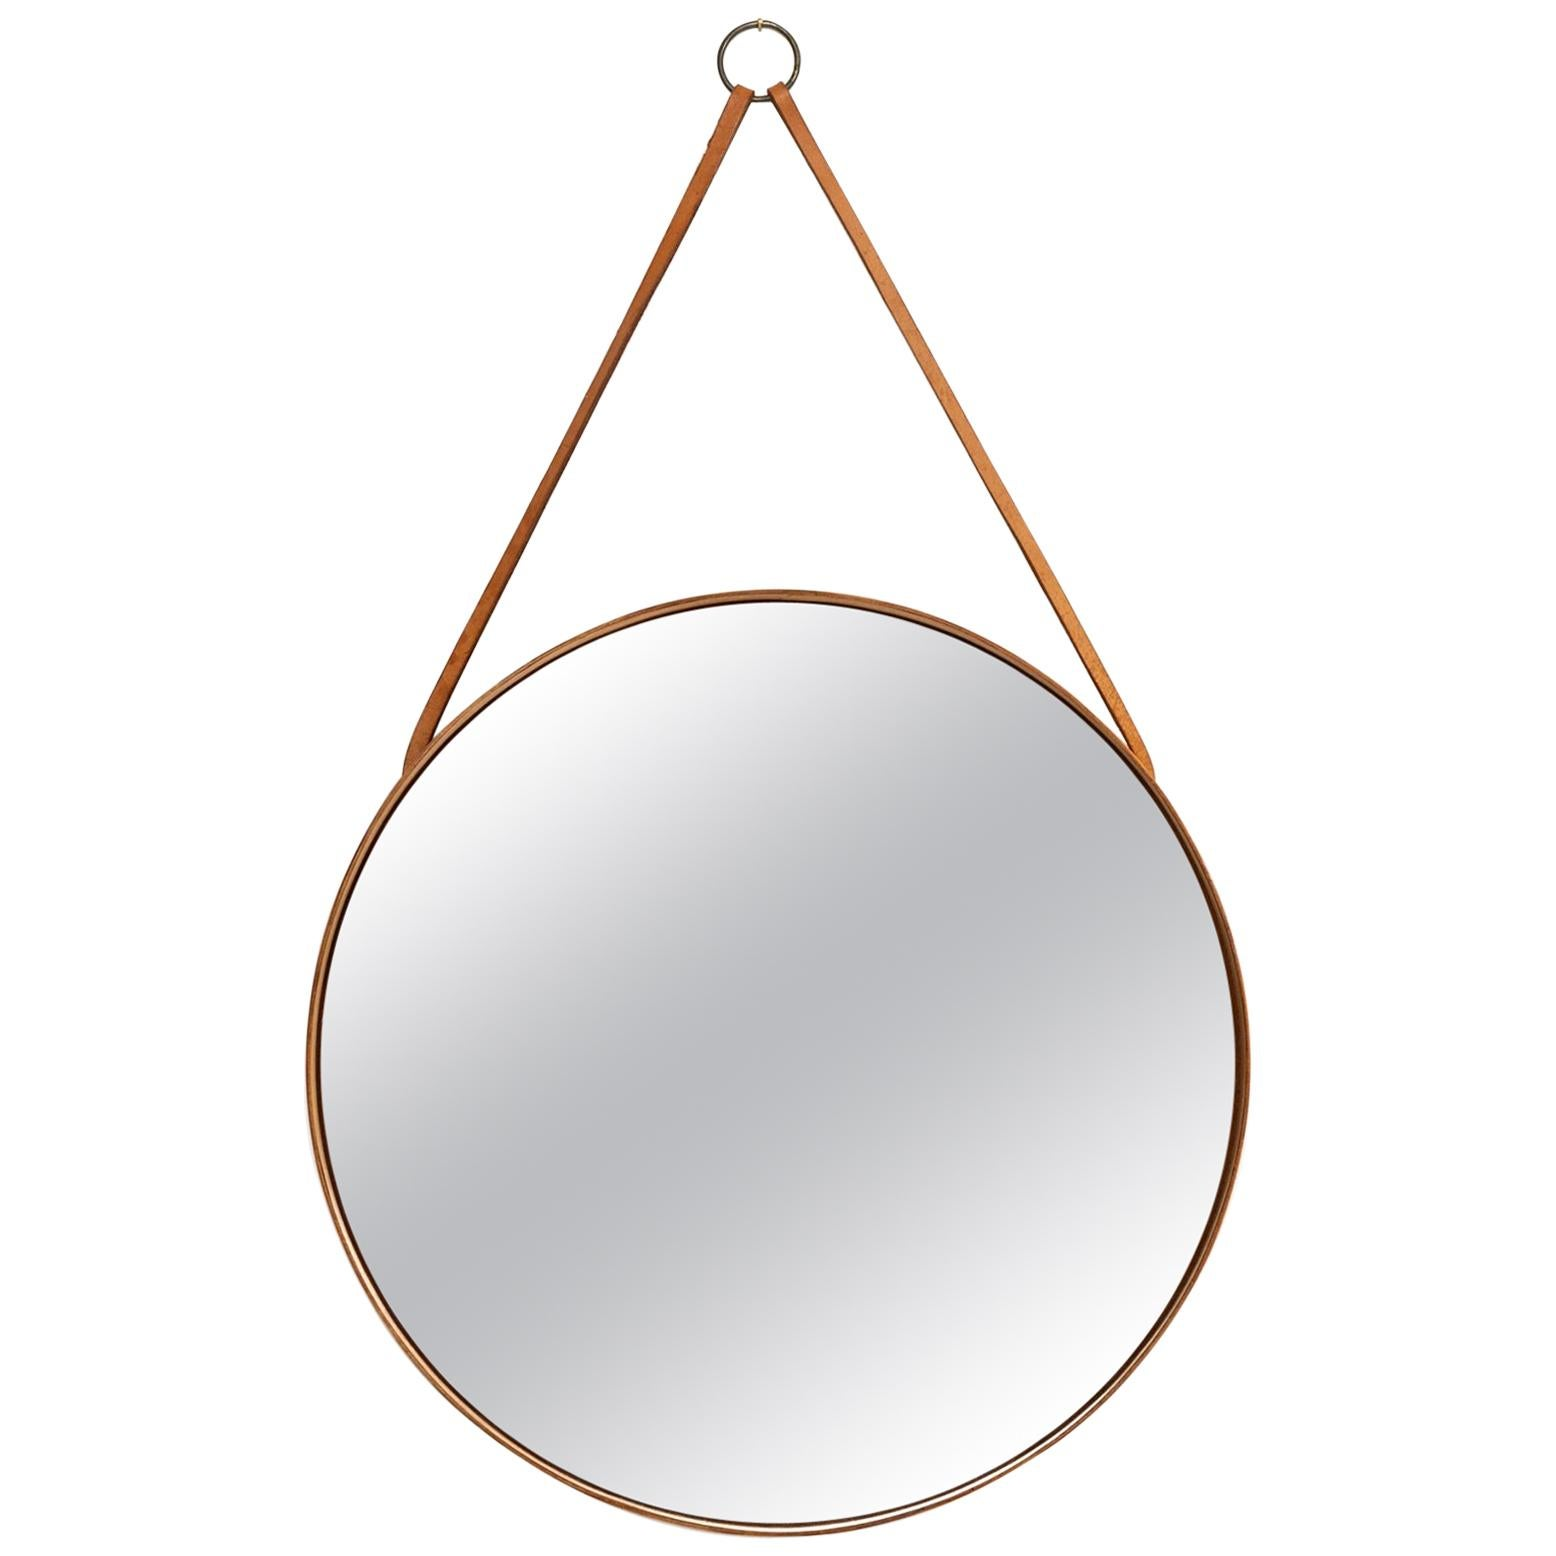 Mirror Produced by Glas Mäster in Markaryd, Sweden